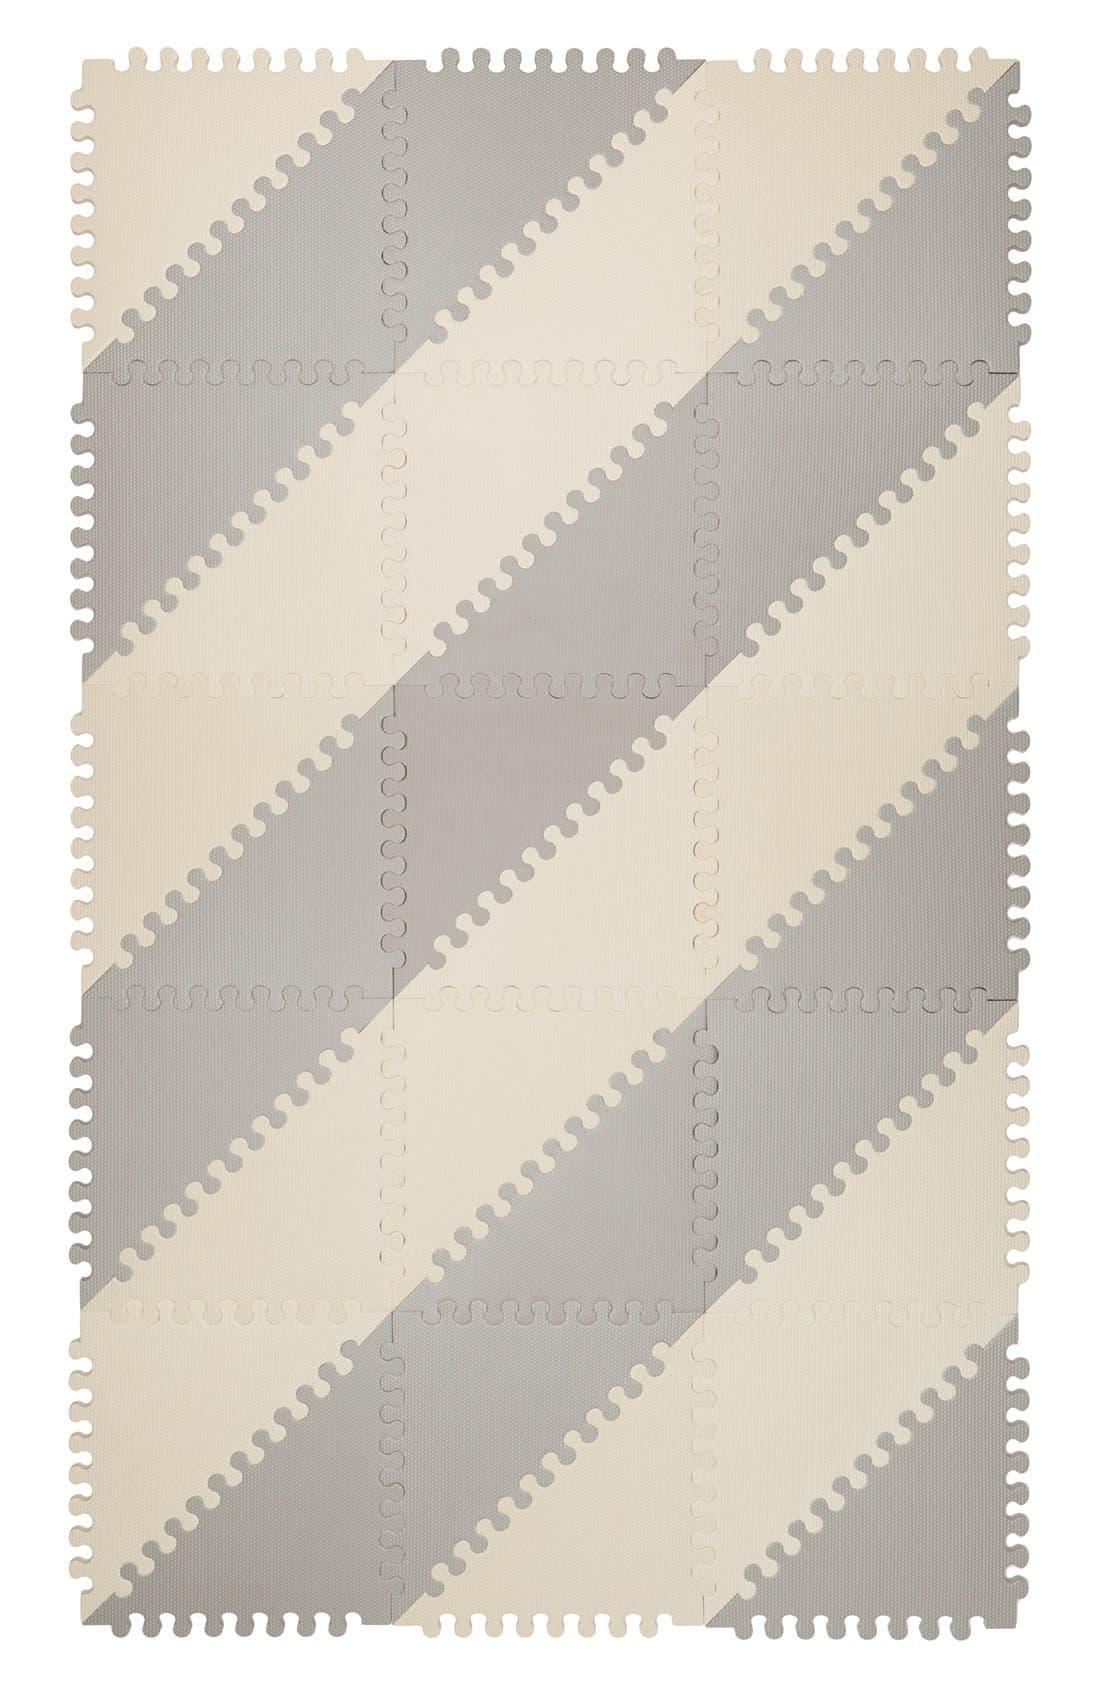 Main Image - Skip Hop 'PLAYSPOTS' Foam Floor Tiles